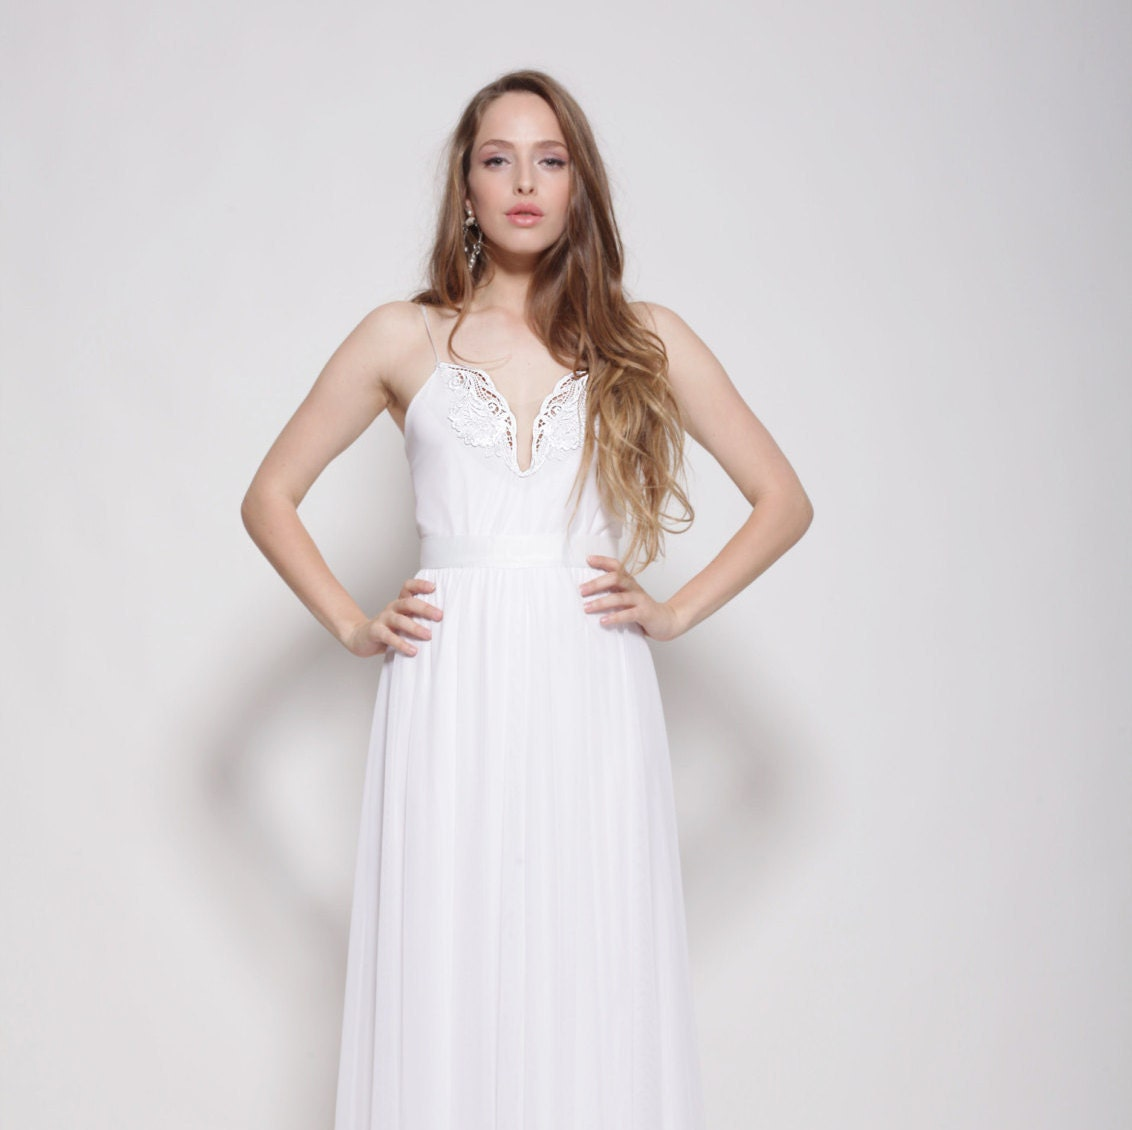 Boho wedding dress strapless wedding dress embroidery | Etsy